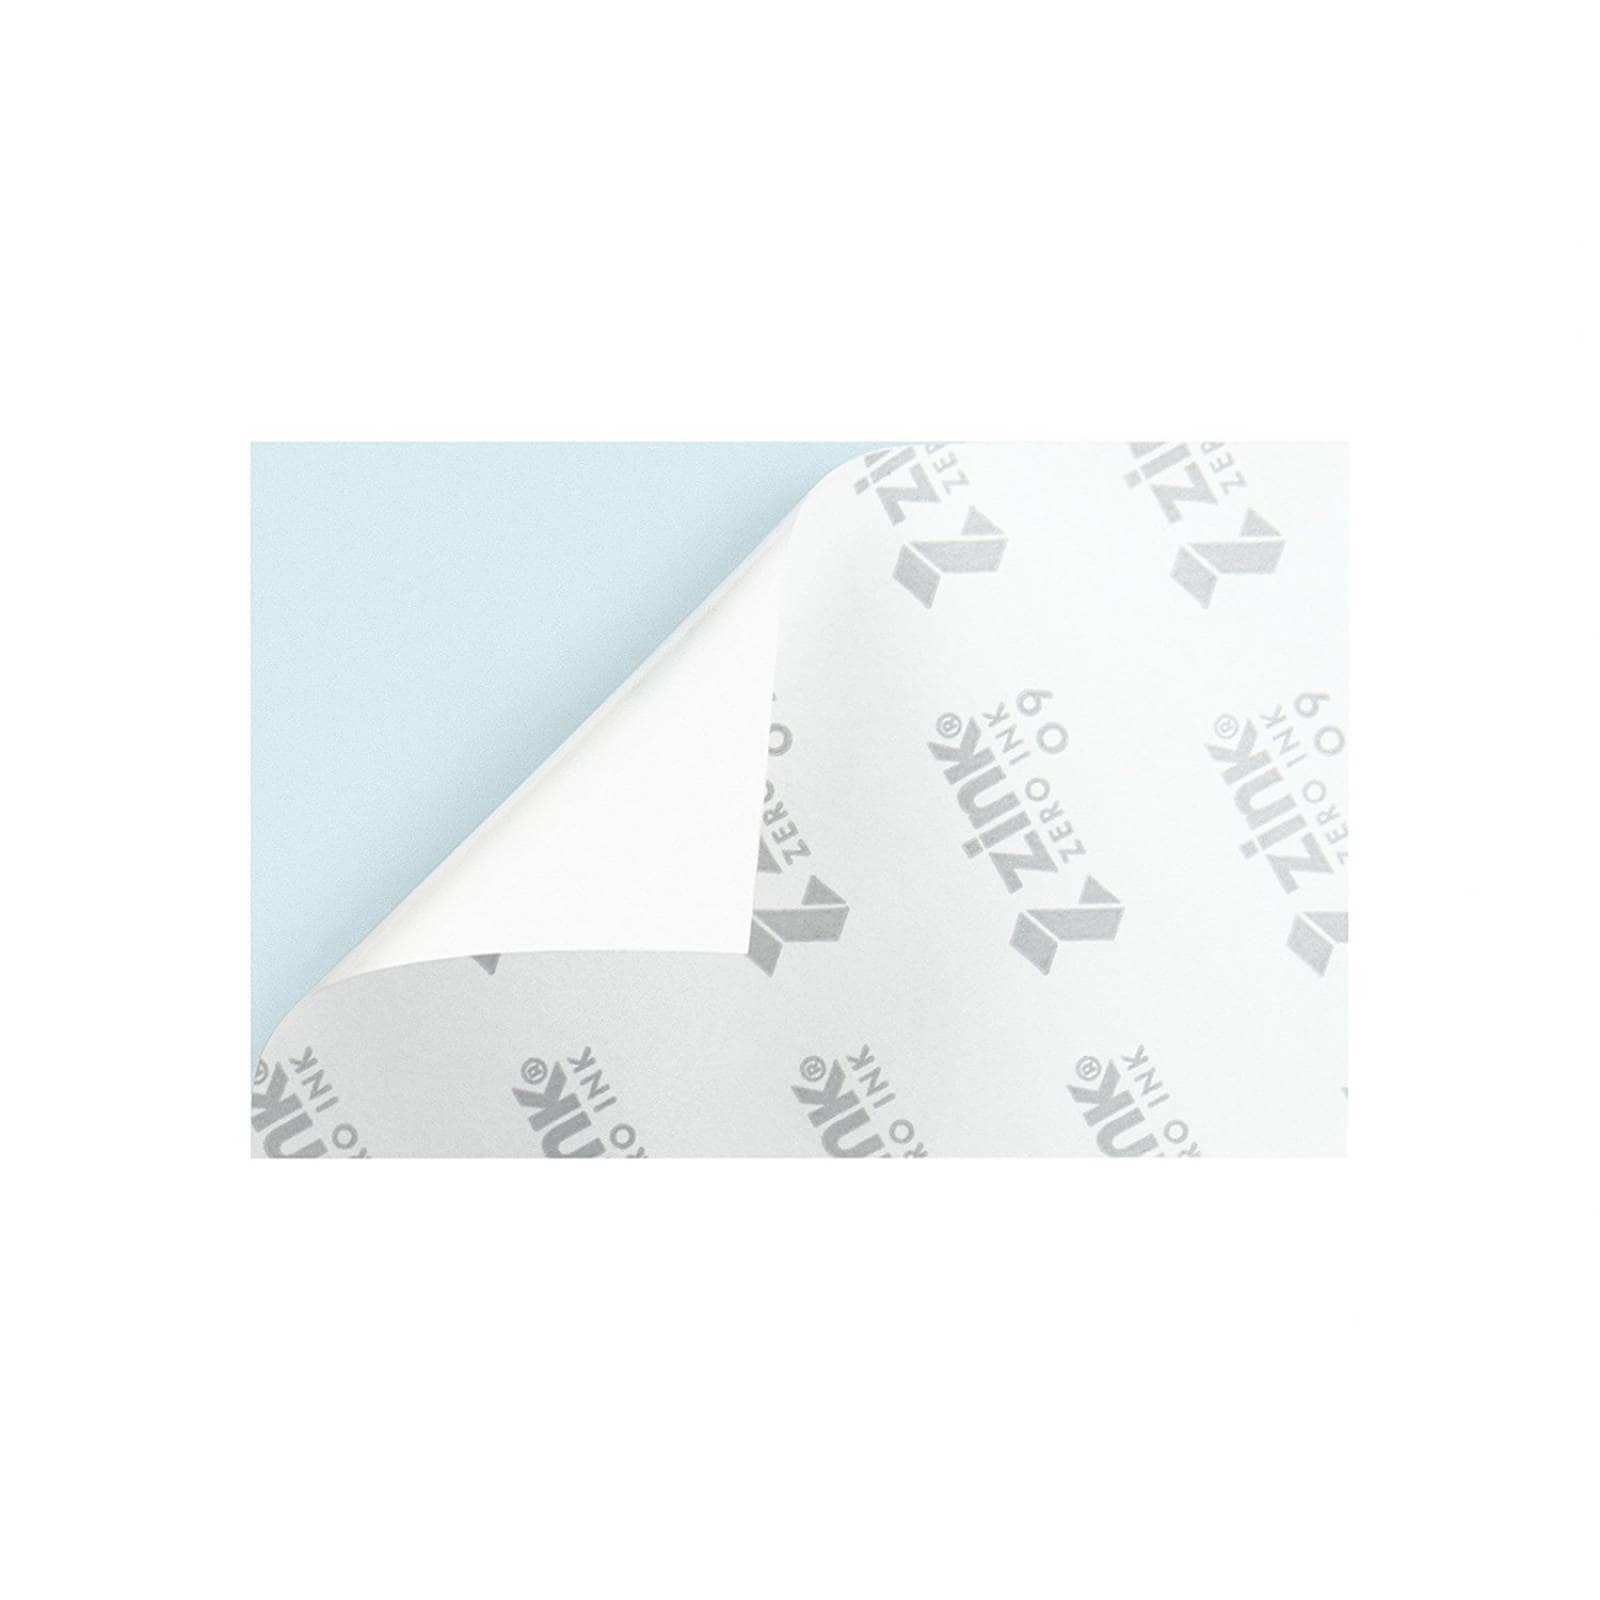 Papel Fotografico HP para Impresora Portatil Sprocket W4Z13A 2x3'' 20 piezas